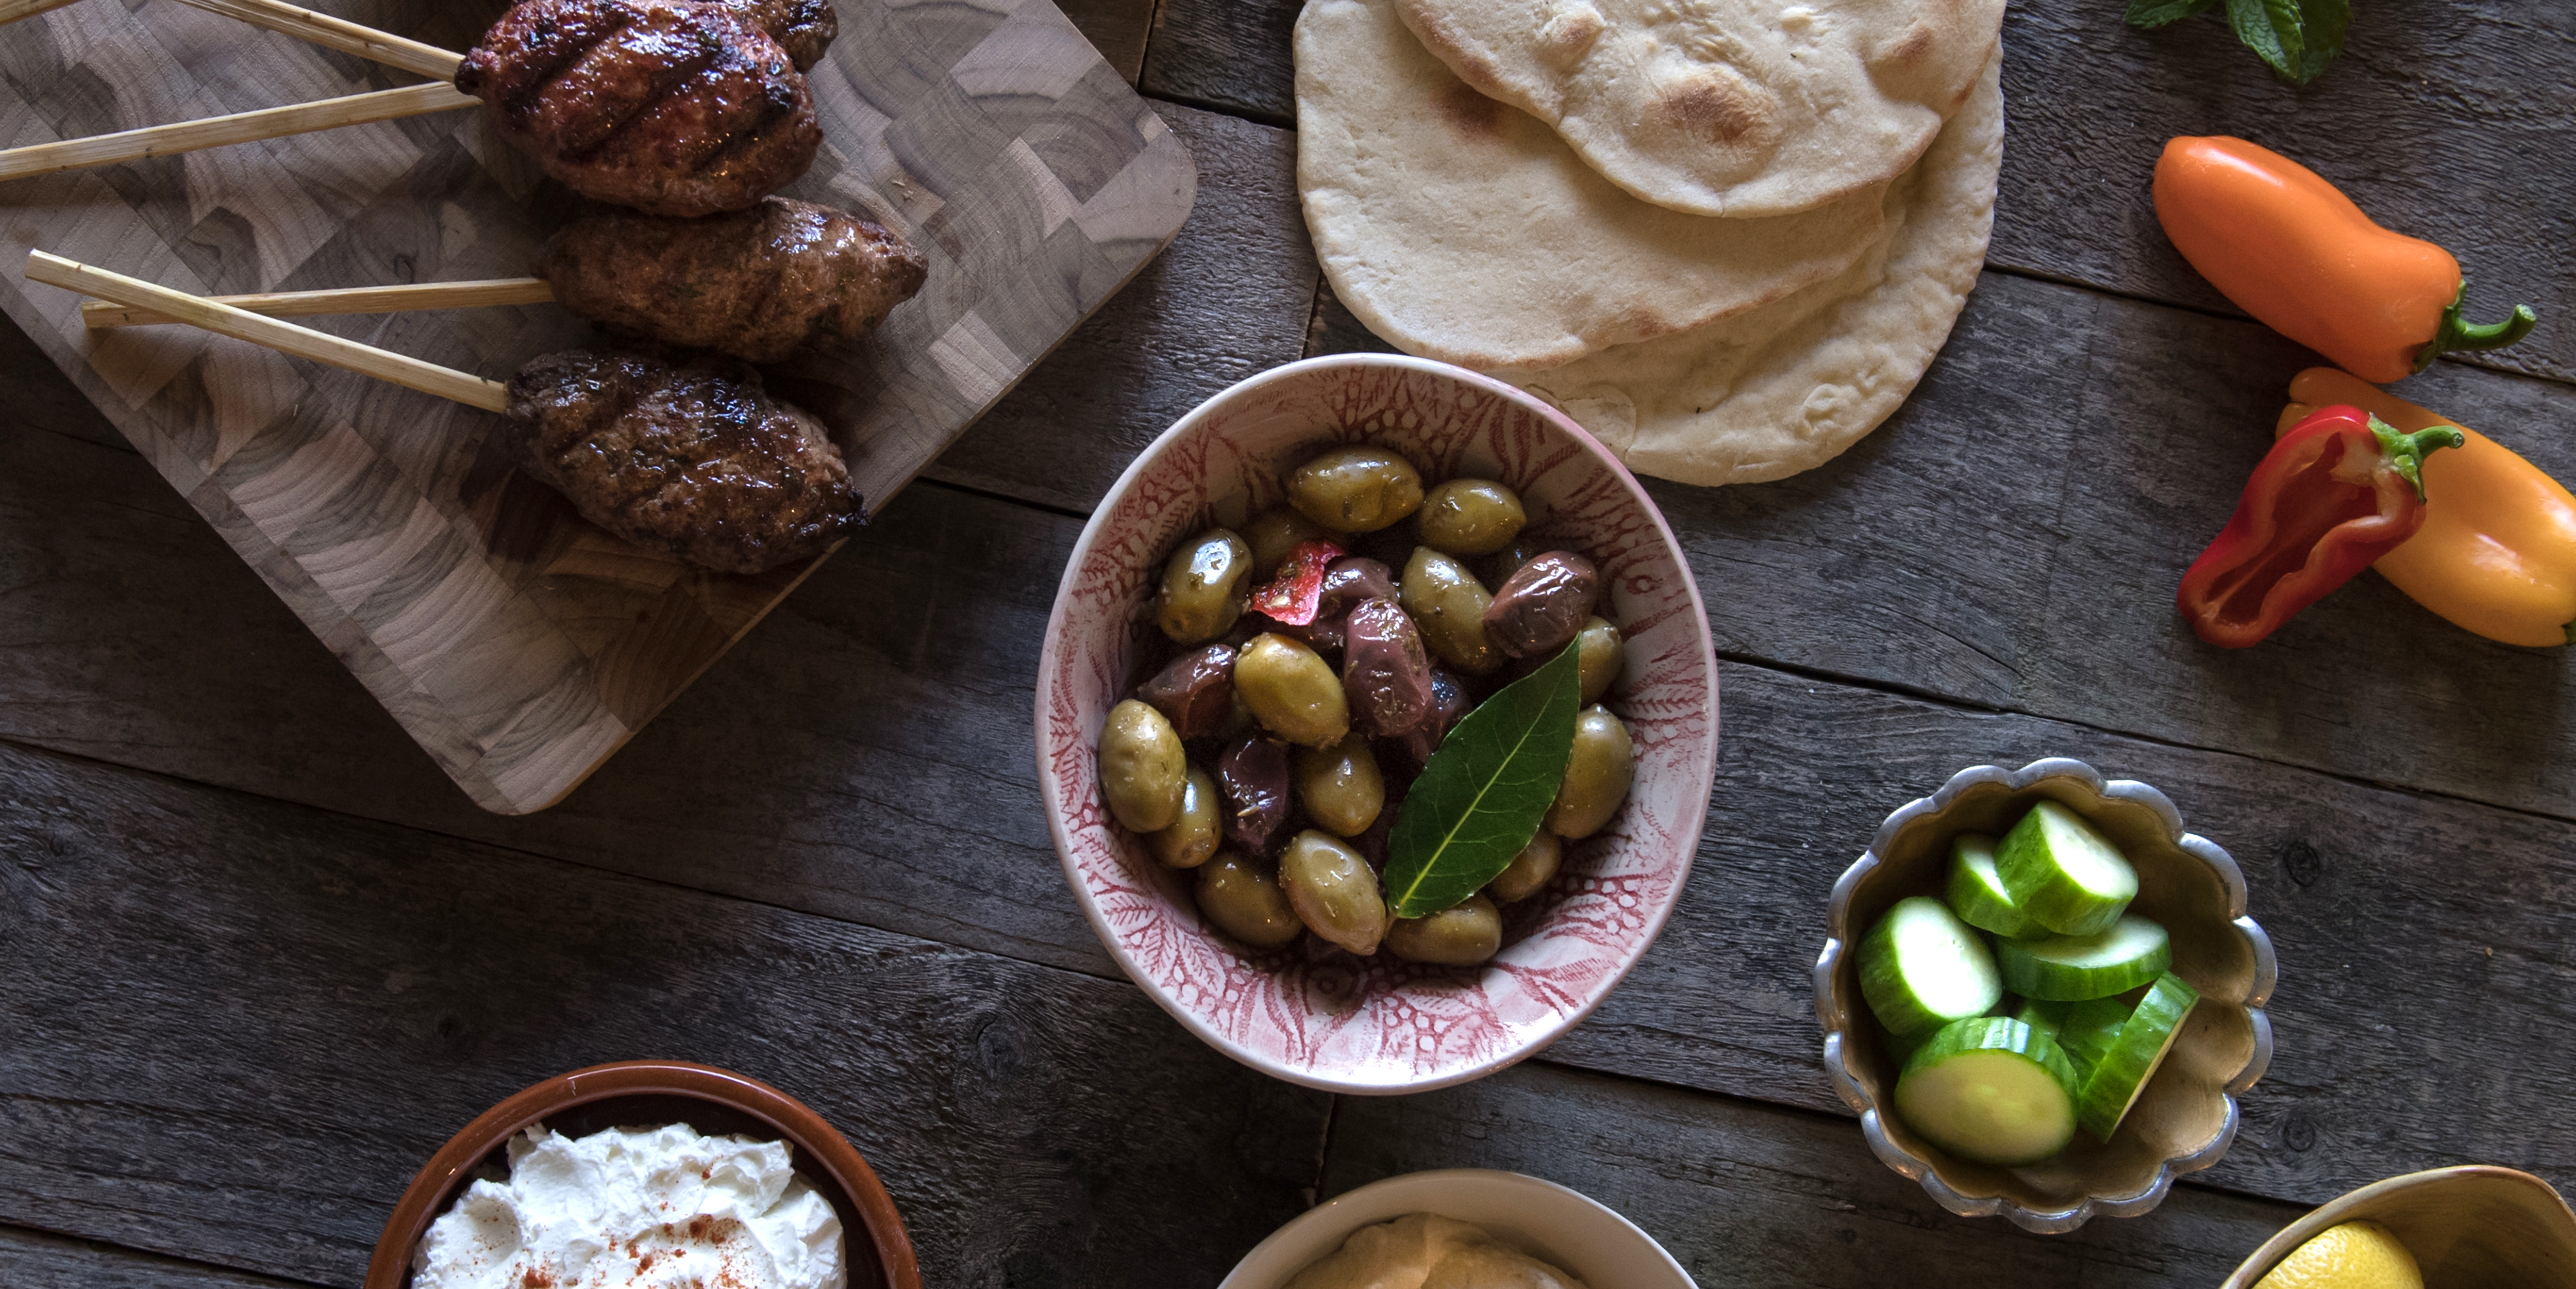 Wrap grilled kofta in fluffy pita with creamy hummus and Mediterranean salad